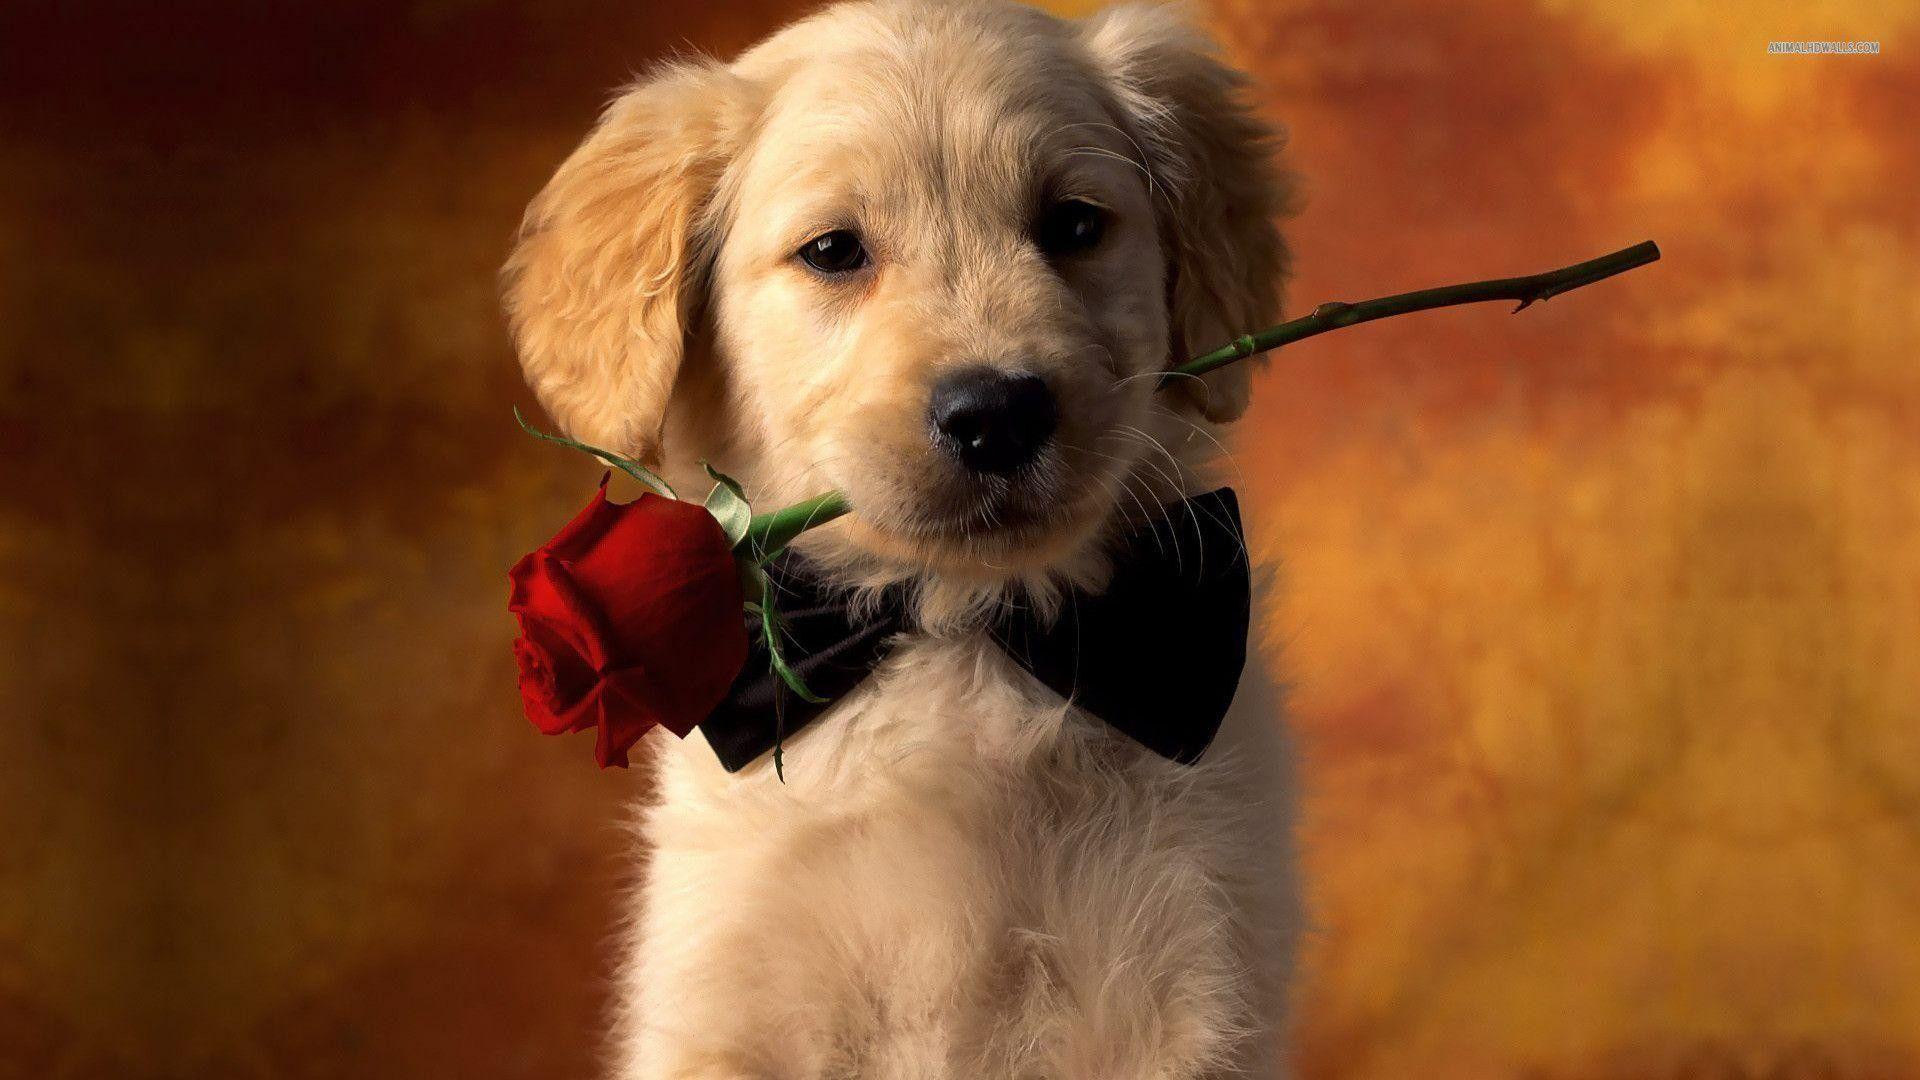 Golden Retriever Puppy Wallpapers Top Free Golden Retriever Puppy Backgrounds Wallpaperaccess